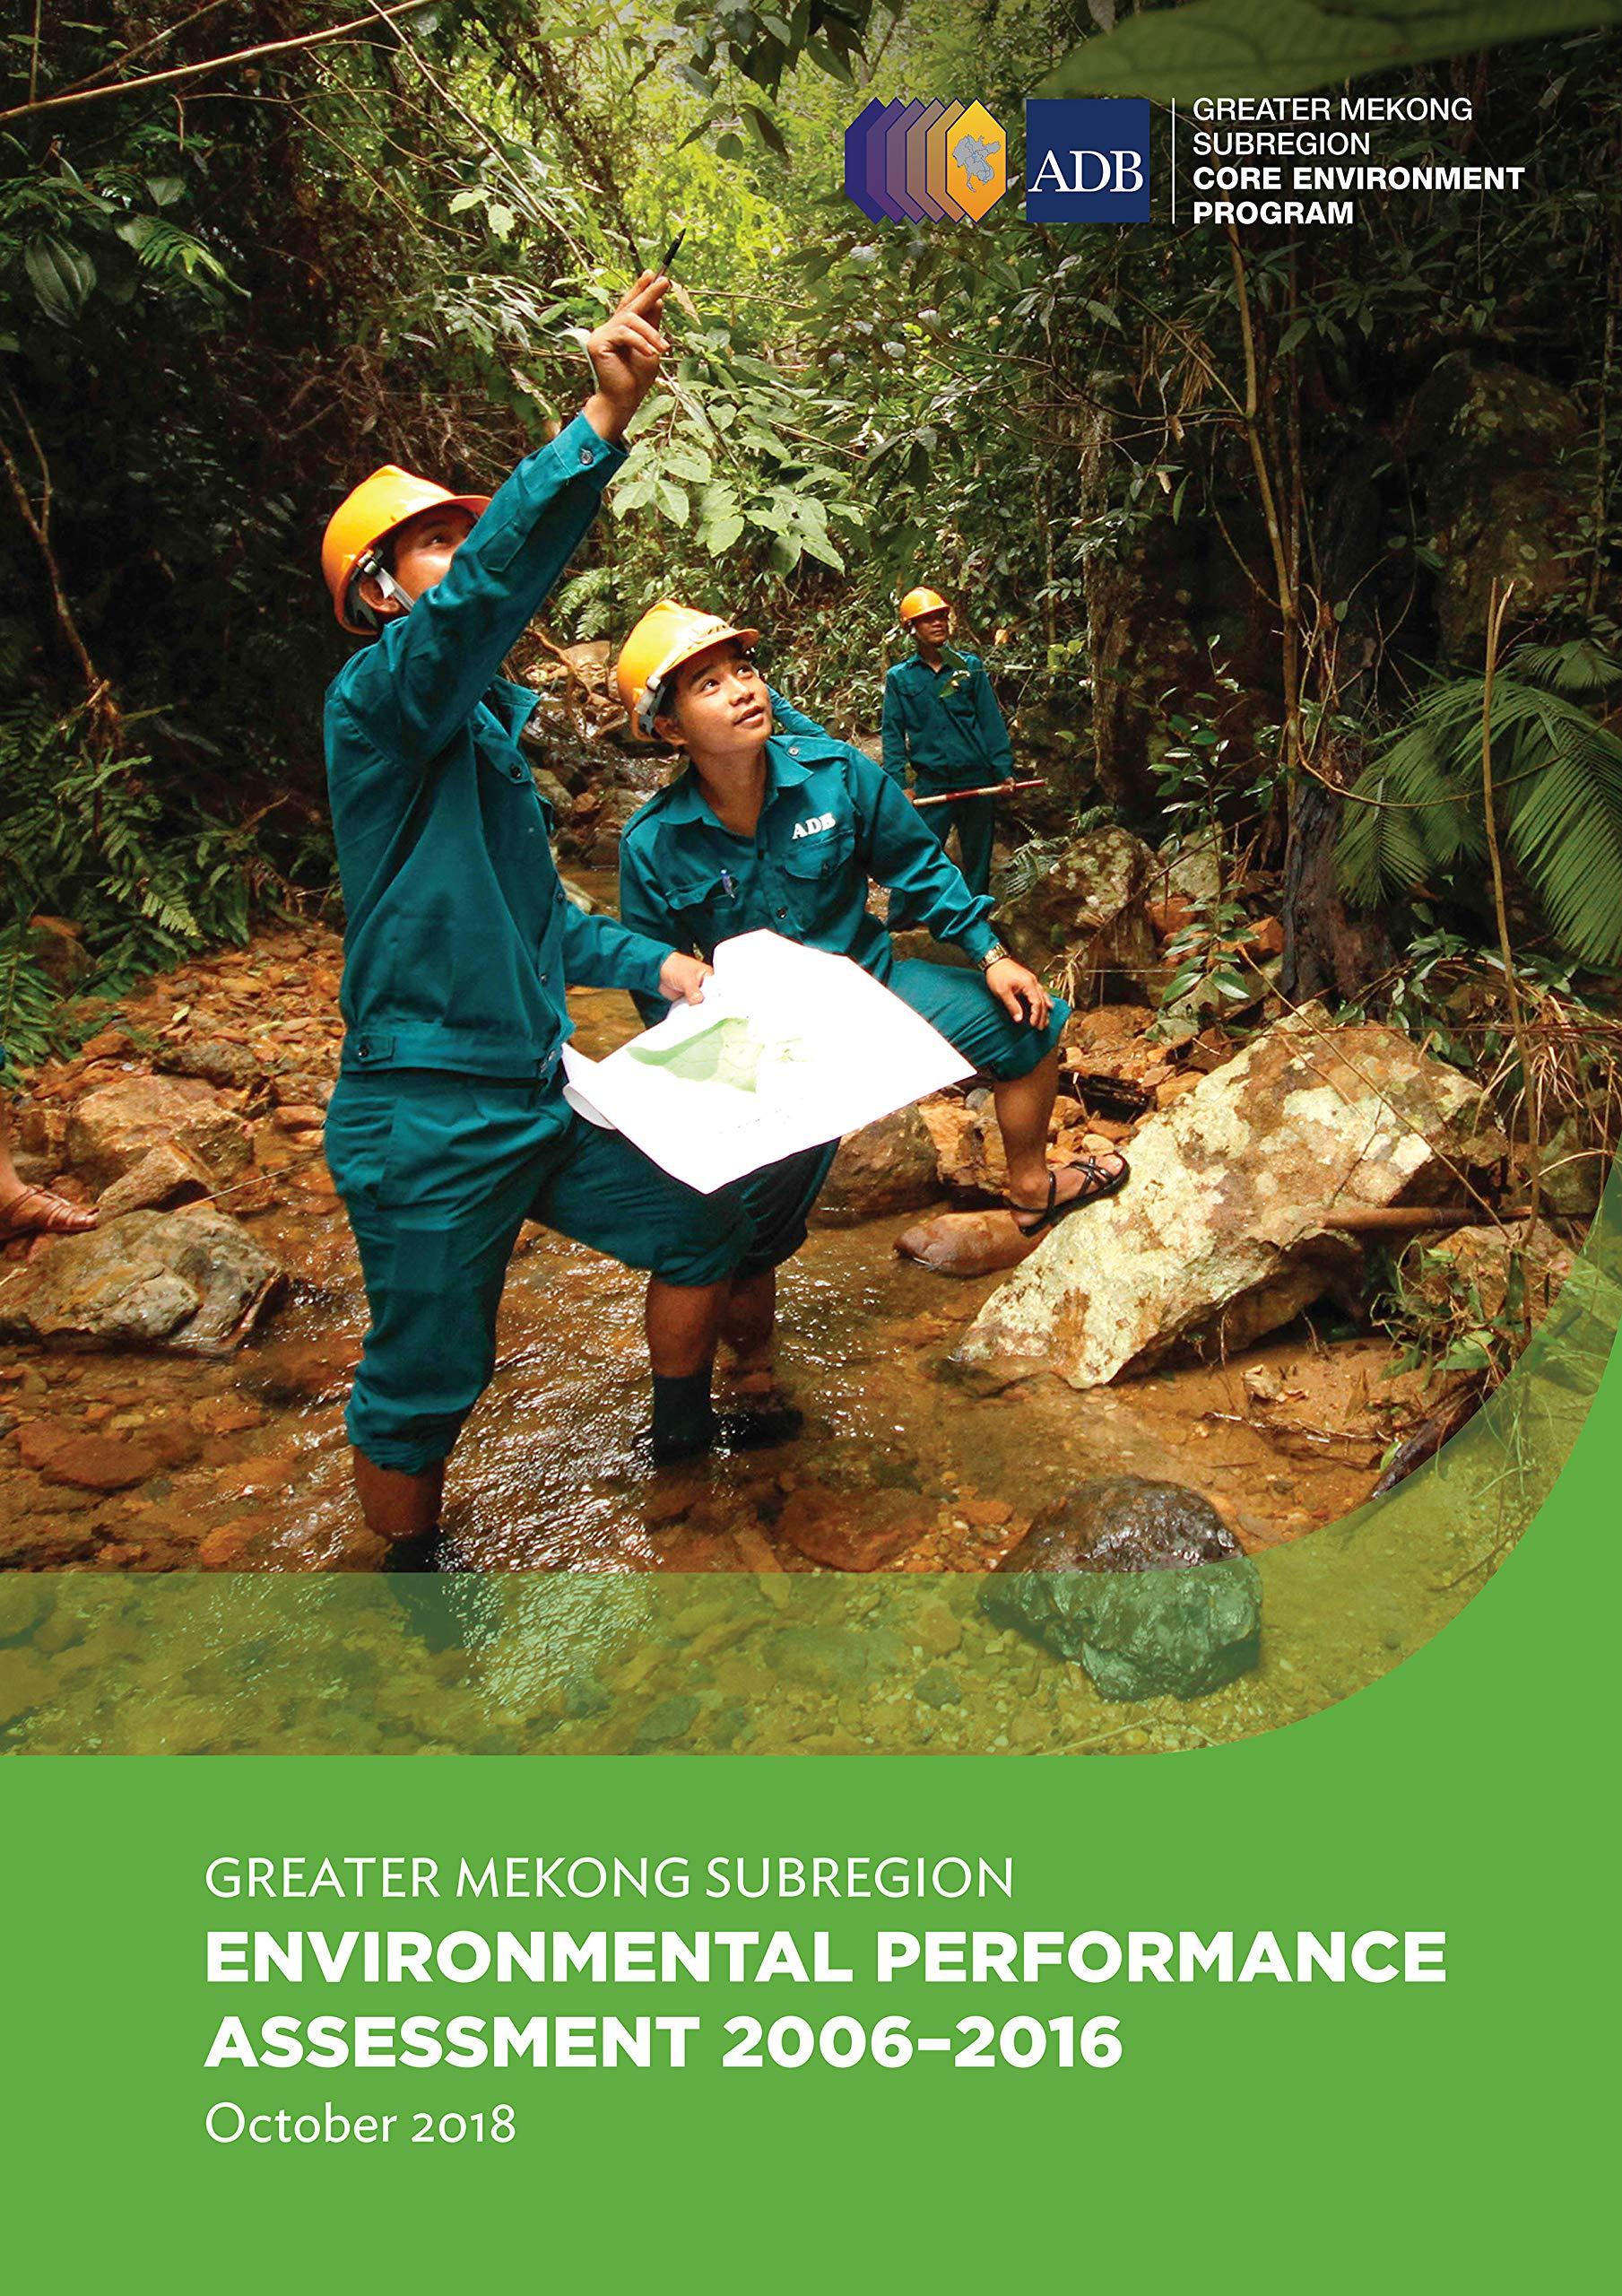 Greater Mekong Subregion Environmental Performance Assessment 2006–2016